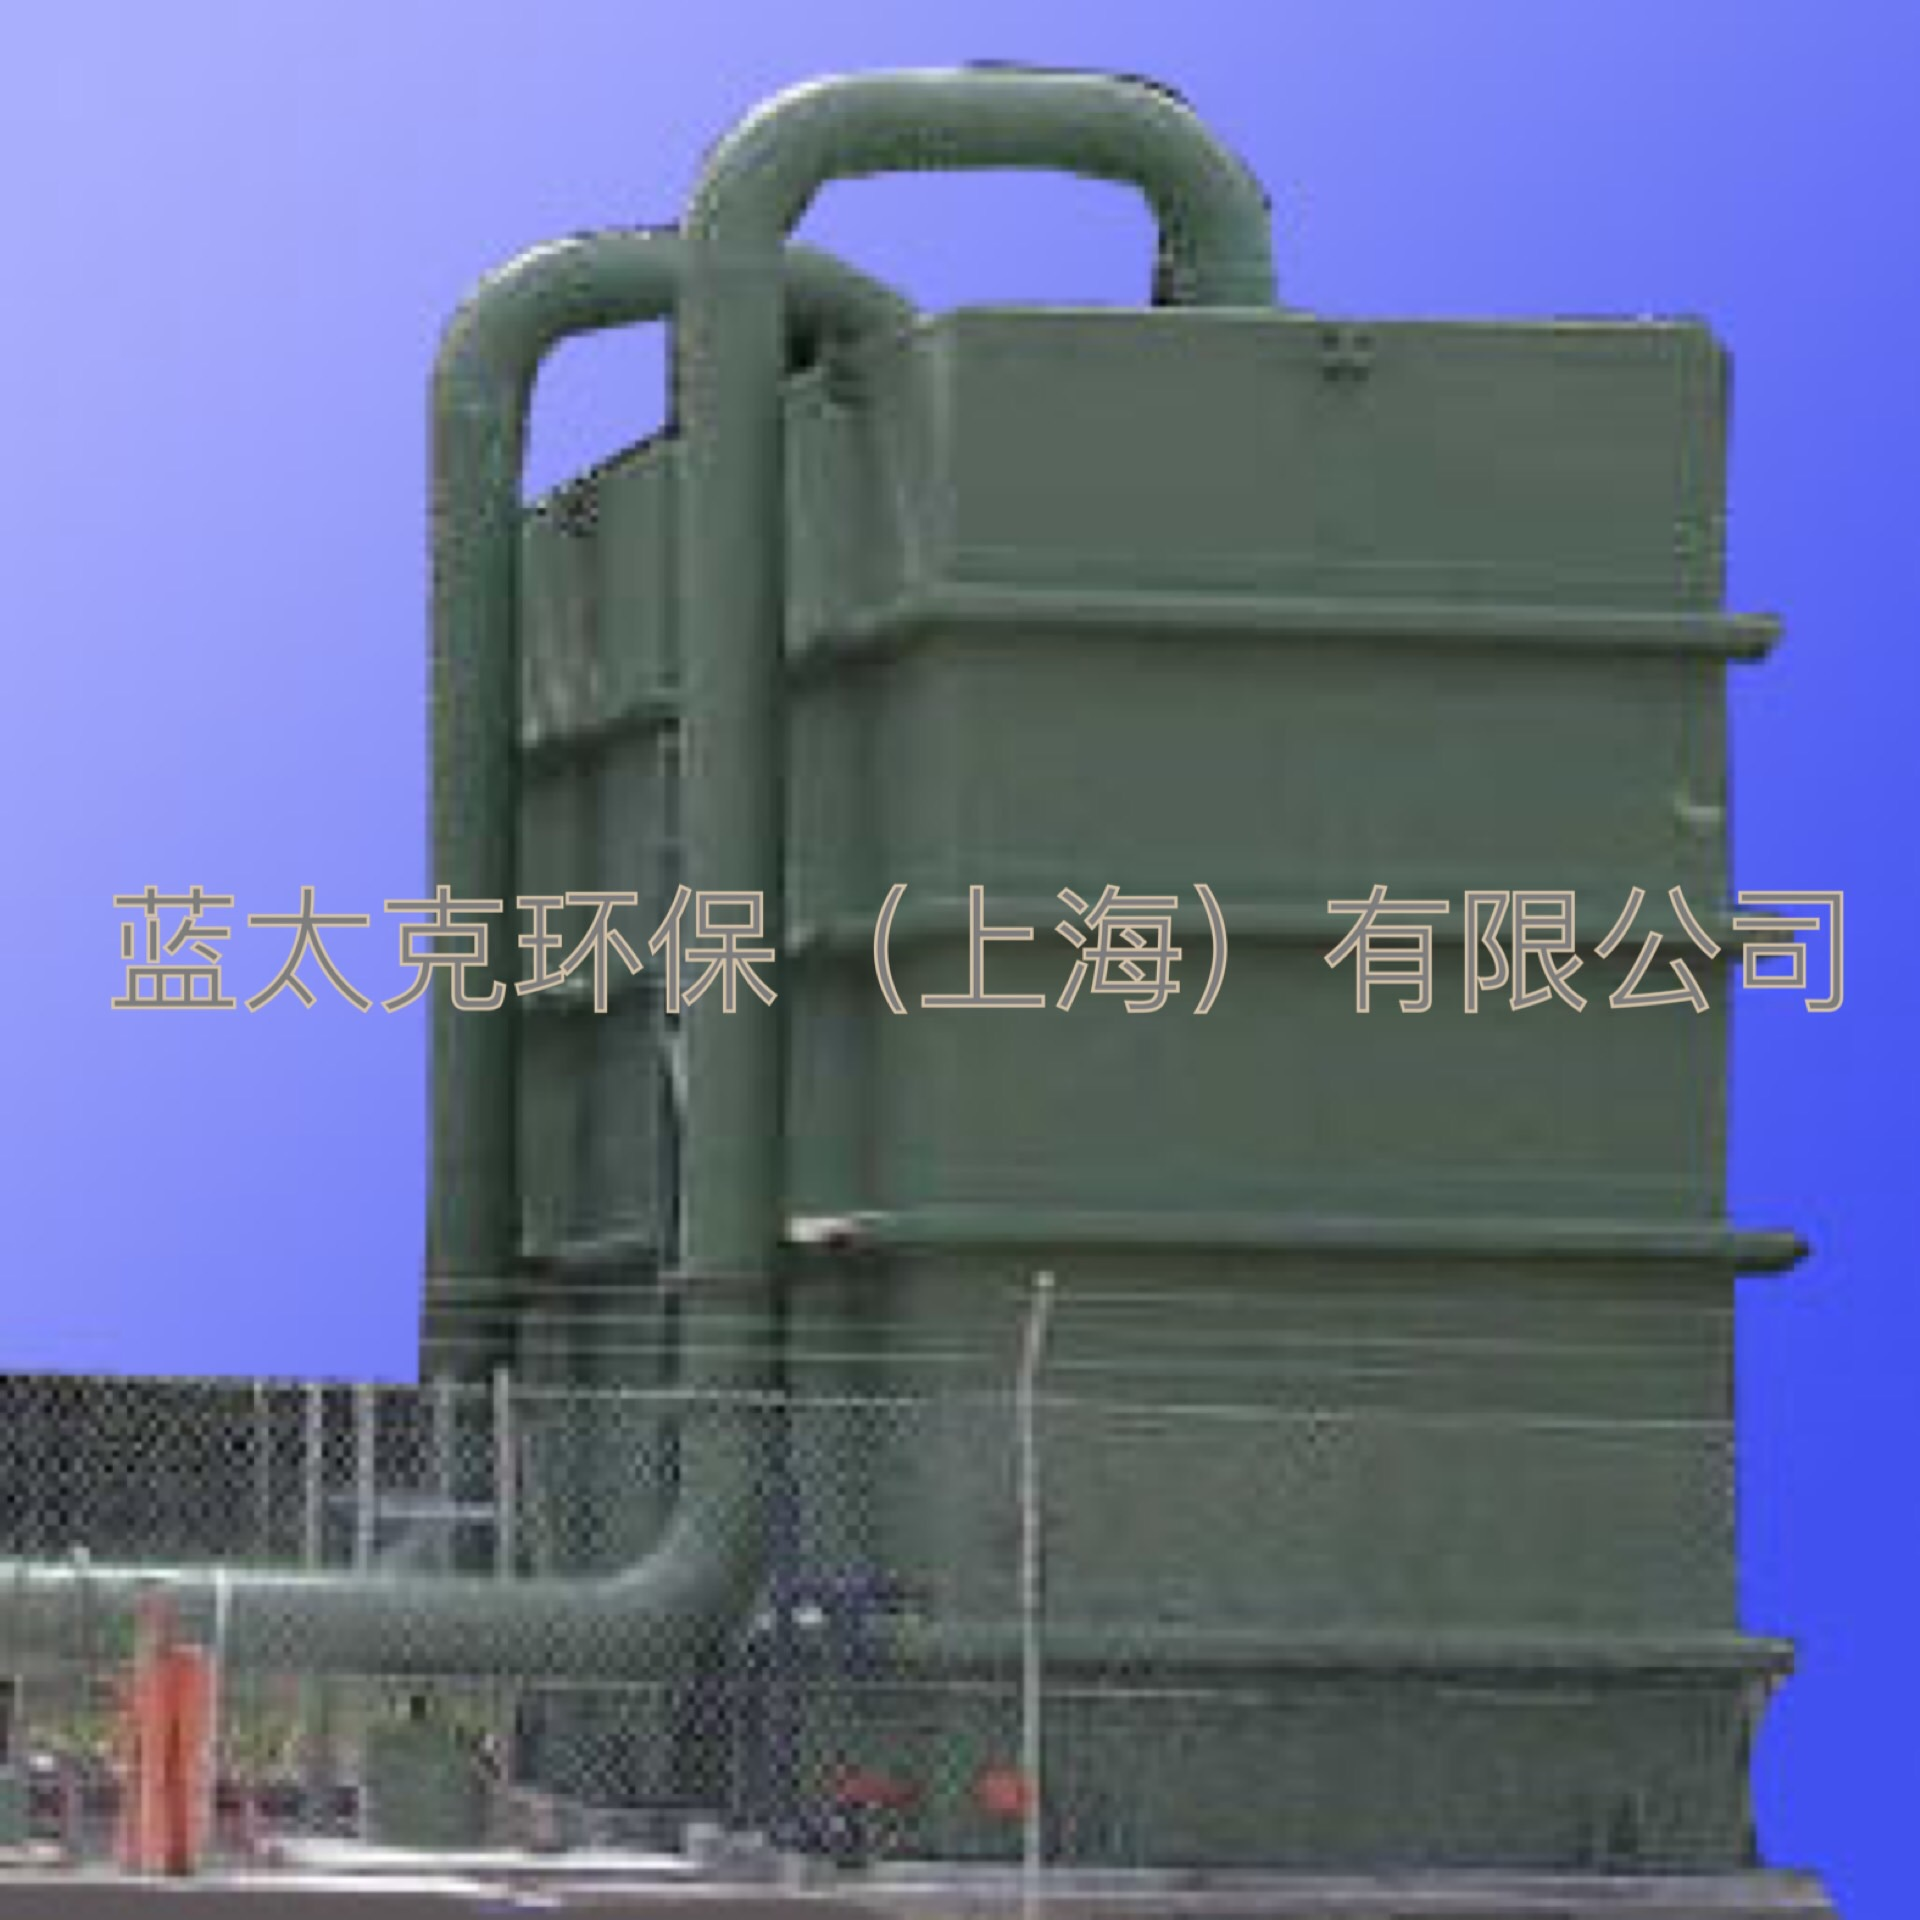 生物滴濾床Bio-scrubber (Biotrickling Filters)